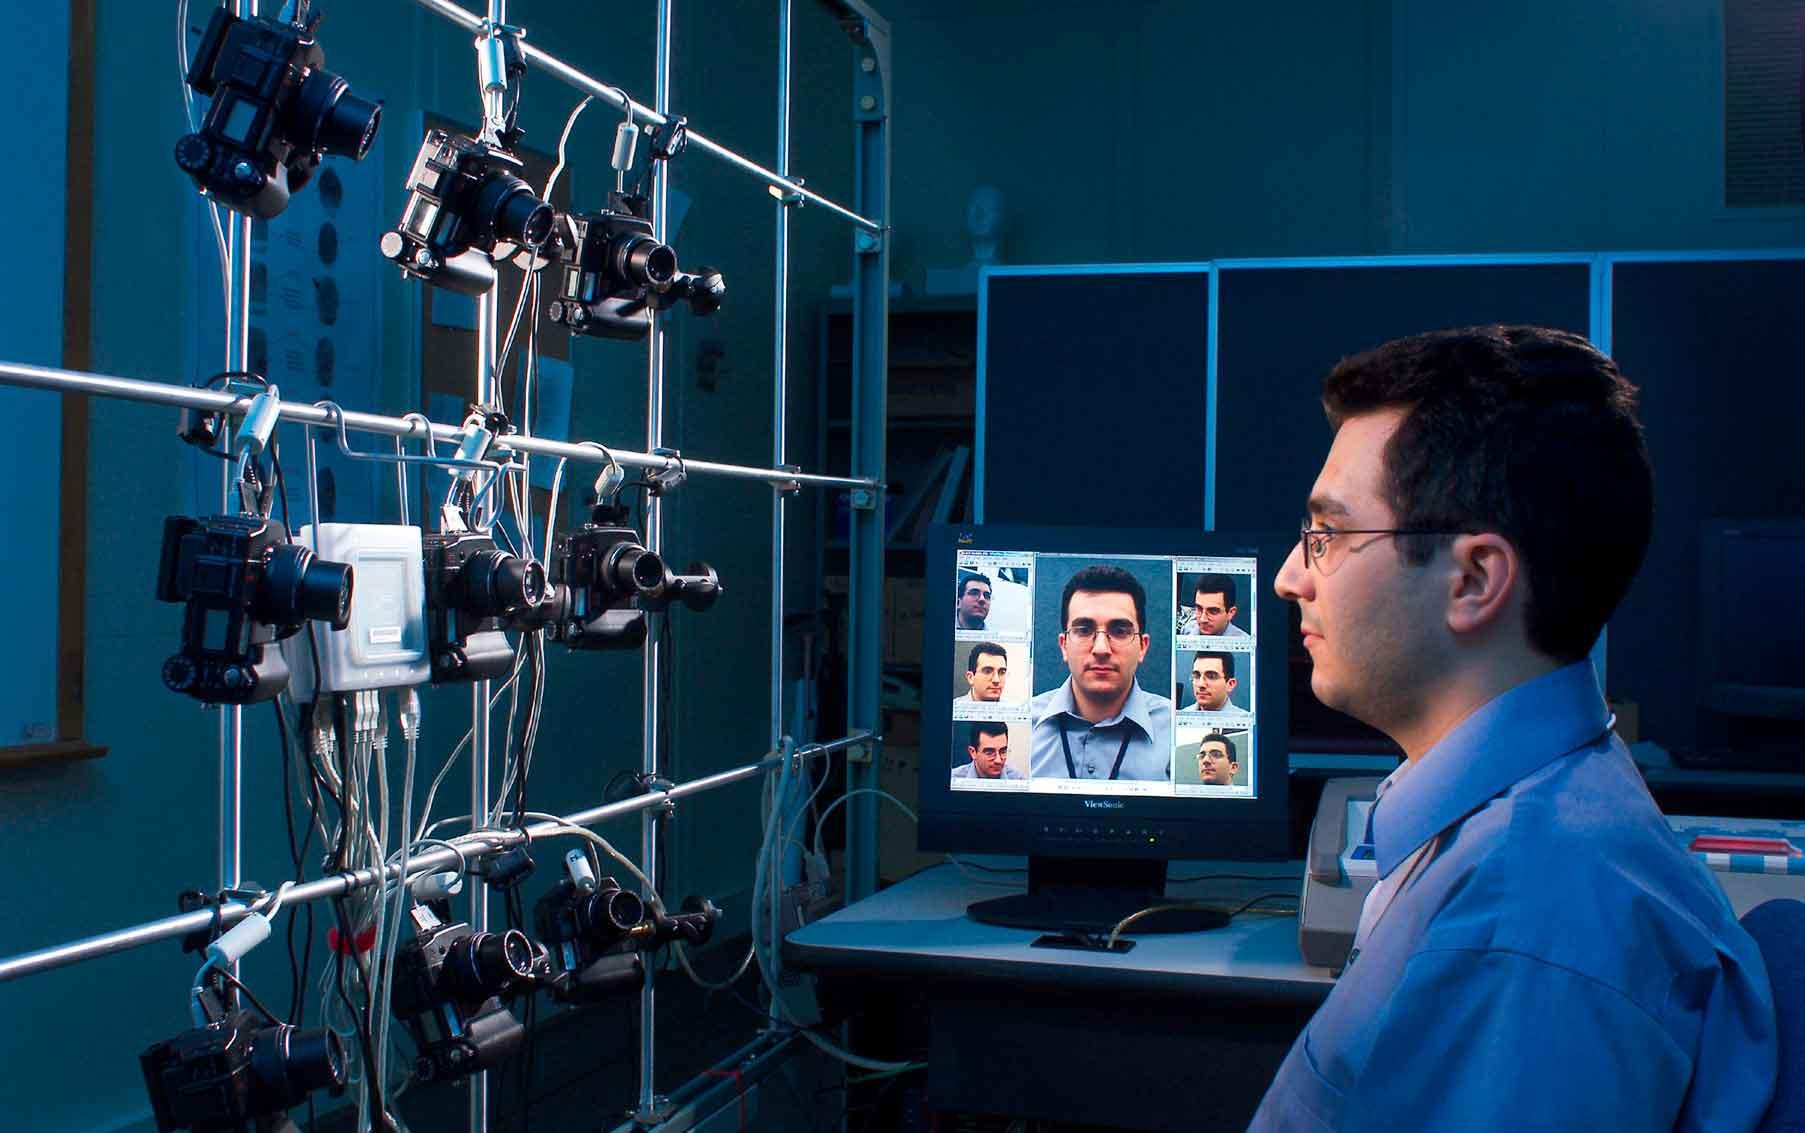 Как работает технолгия распознавание лиц?